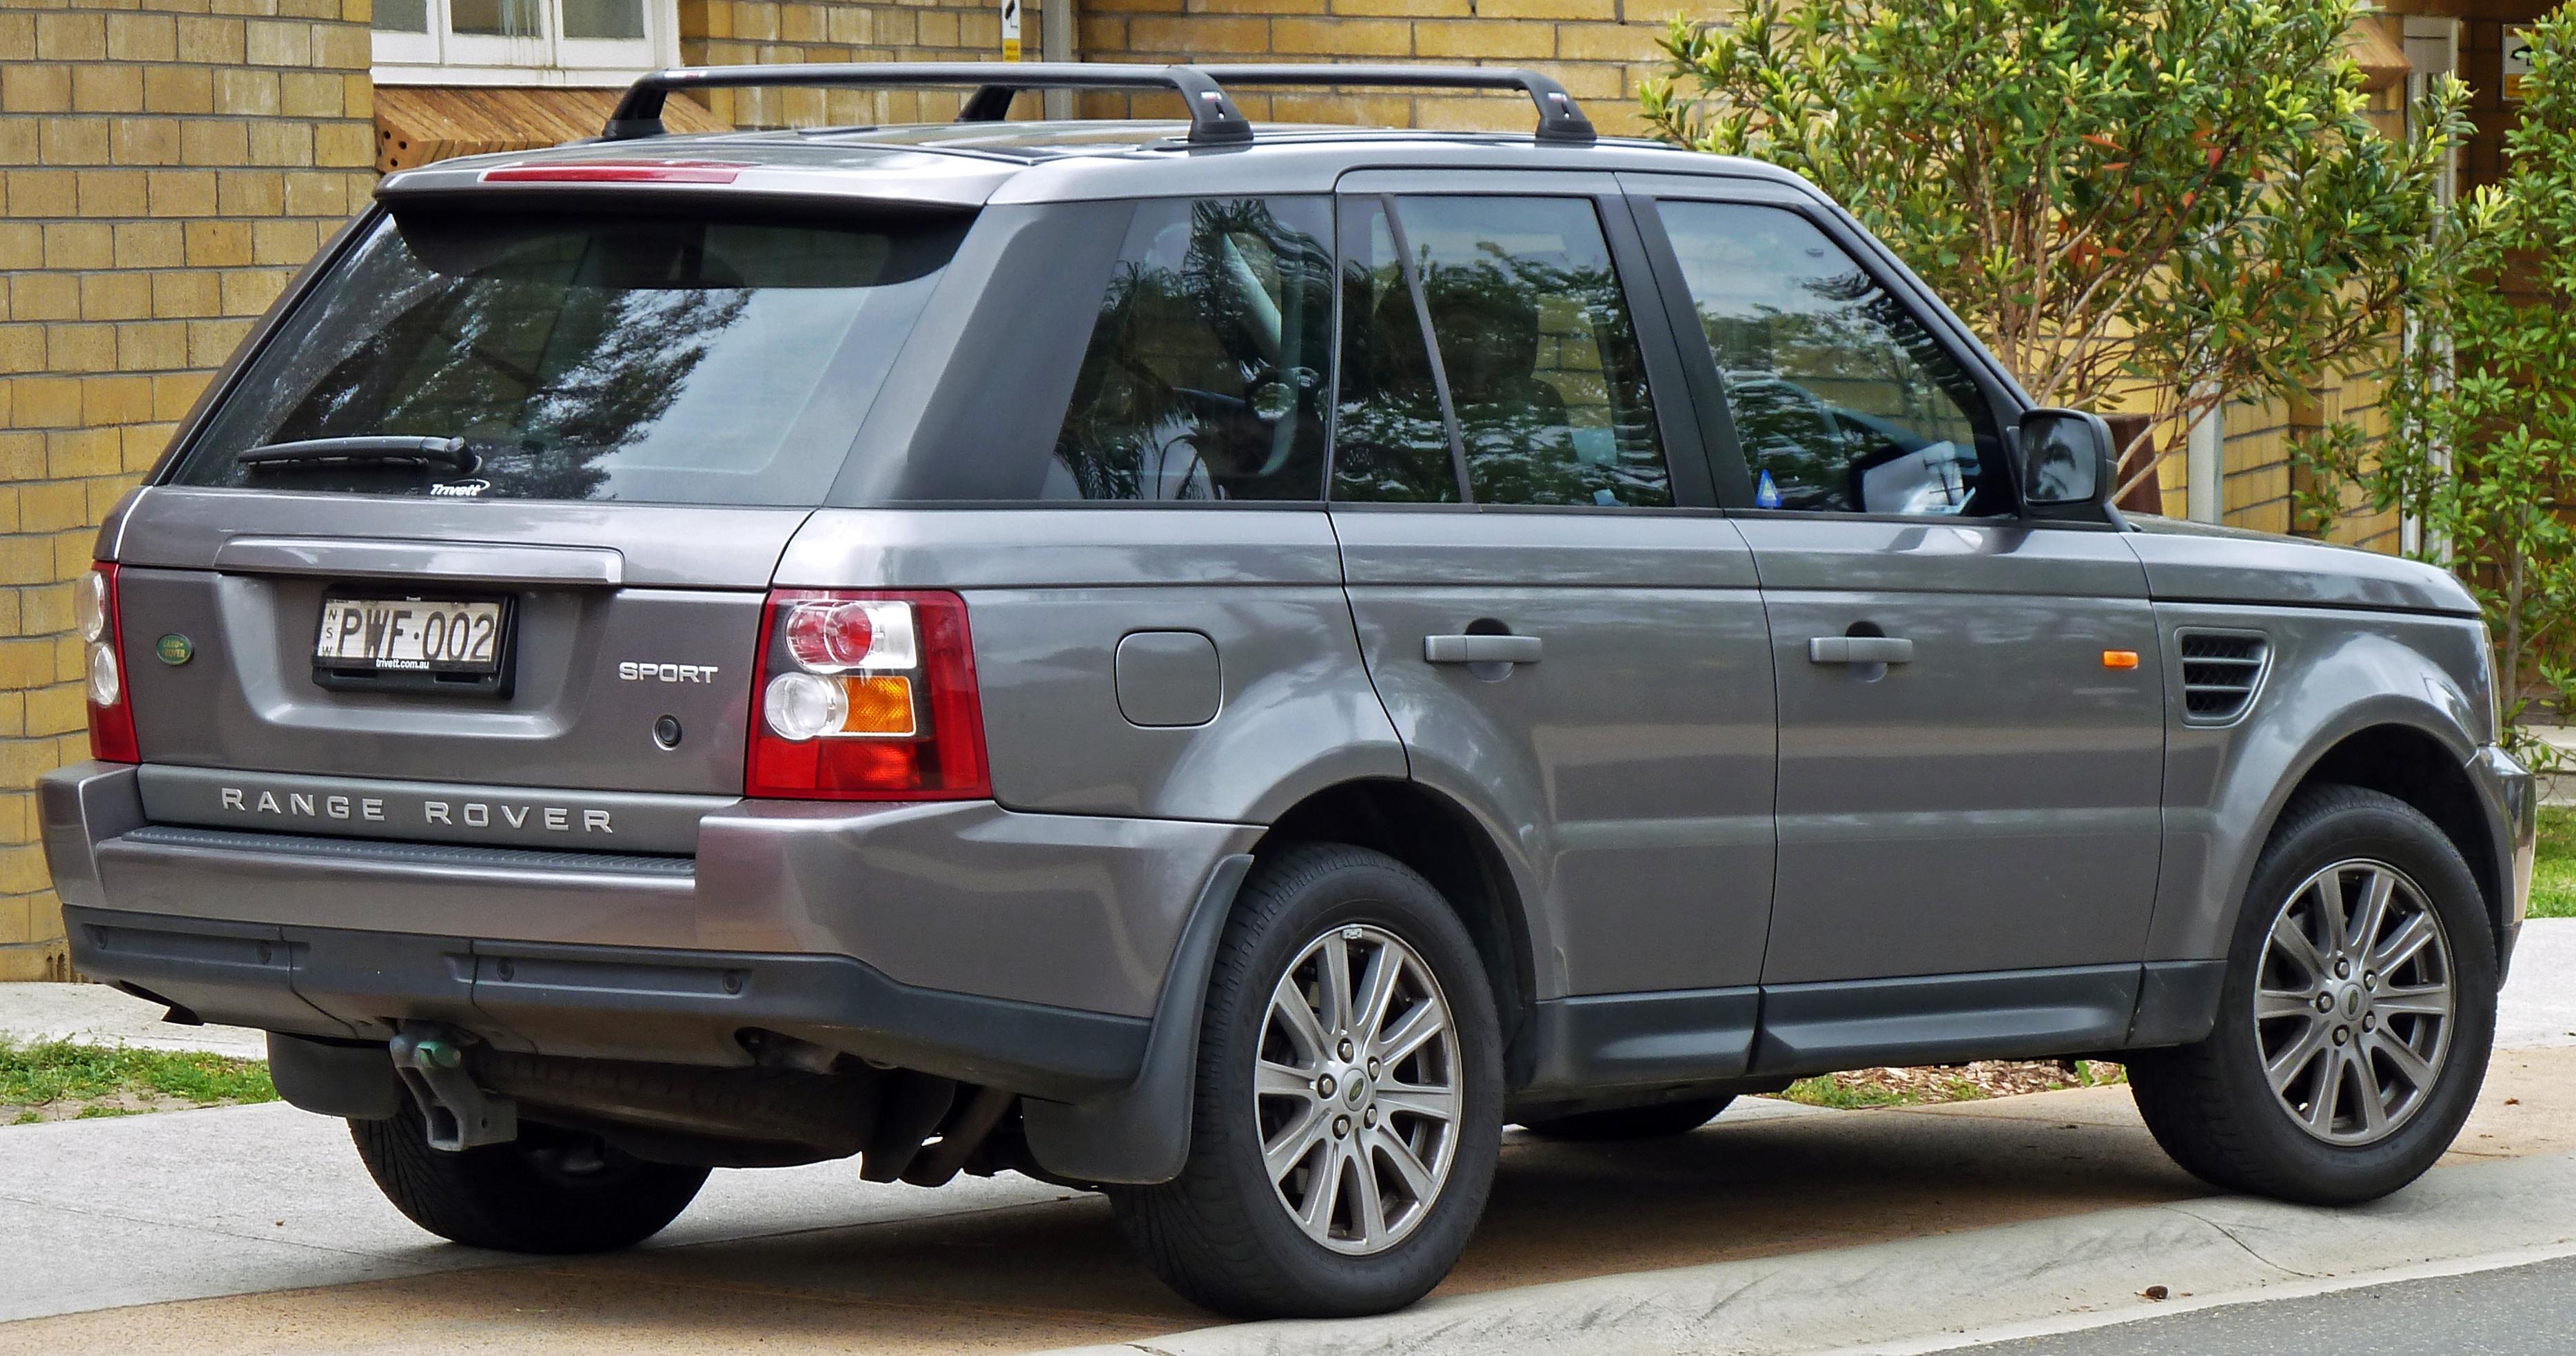 Range Rover Sport Used Cars